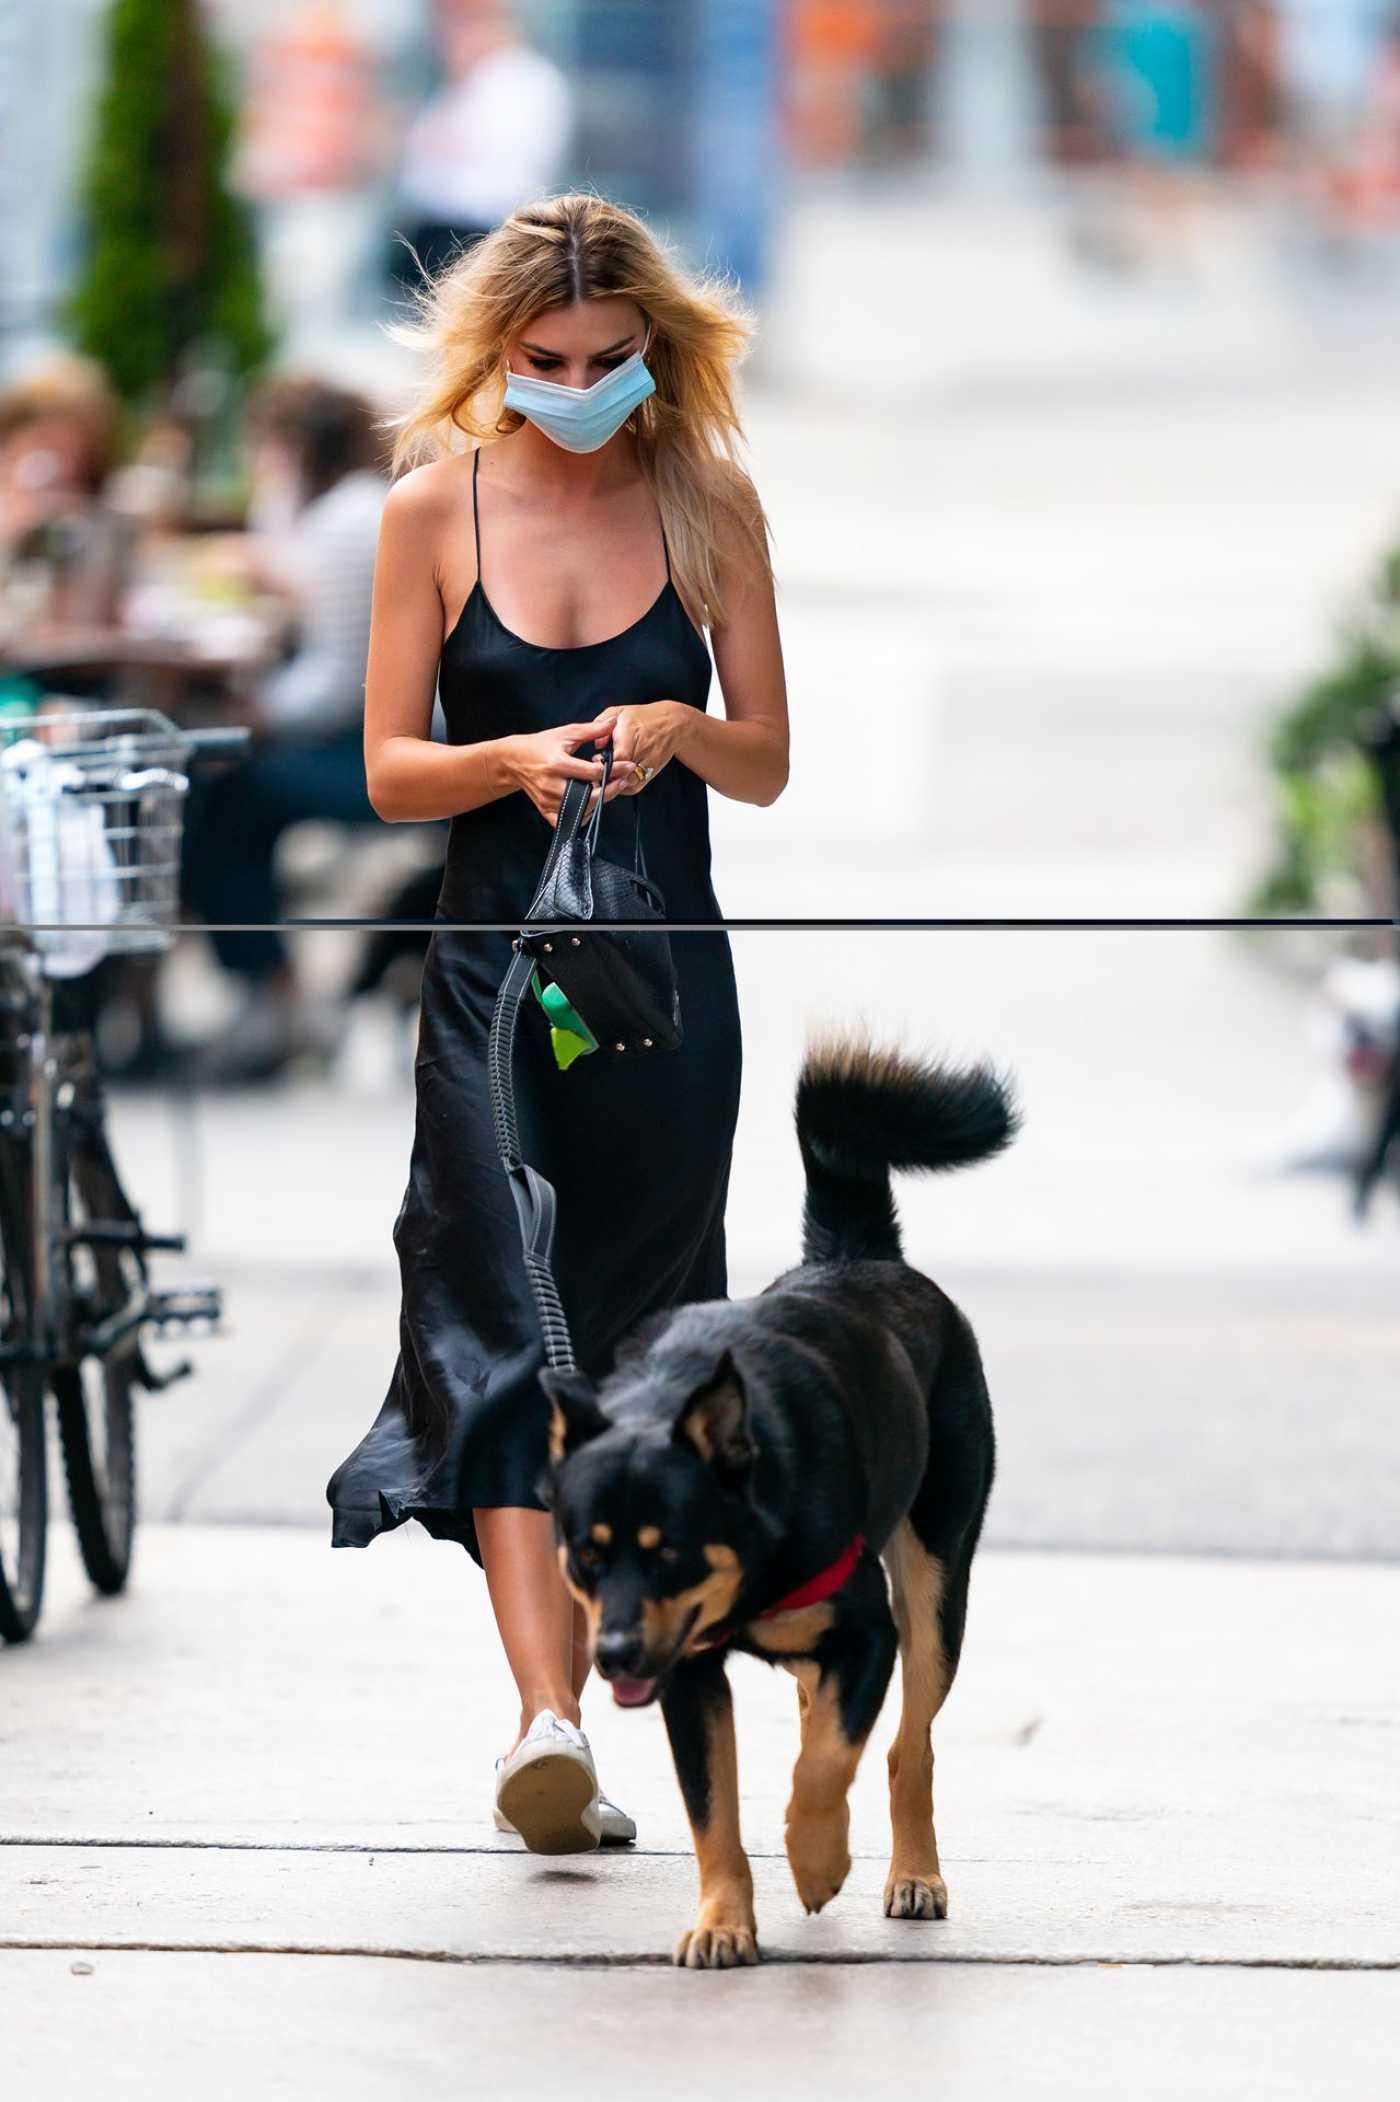 Emily Ratajkowski in a Black Dress Walks Her Dog Colombo in New York City 07/07/2020